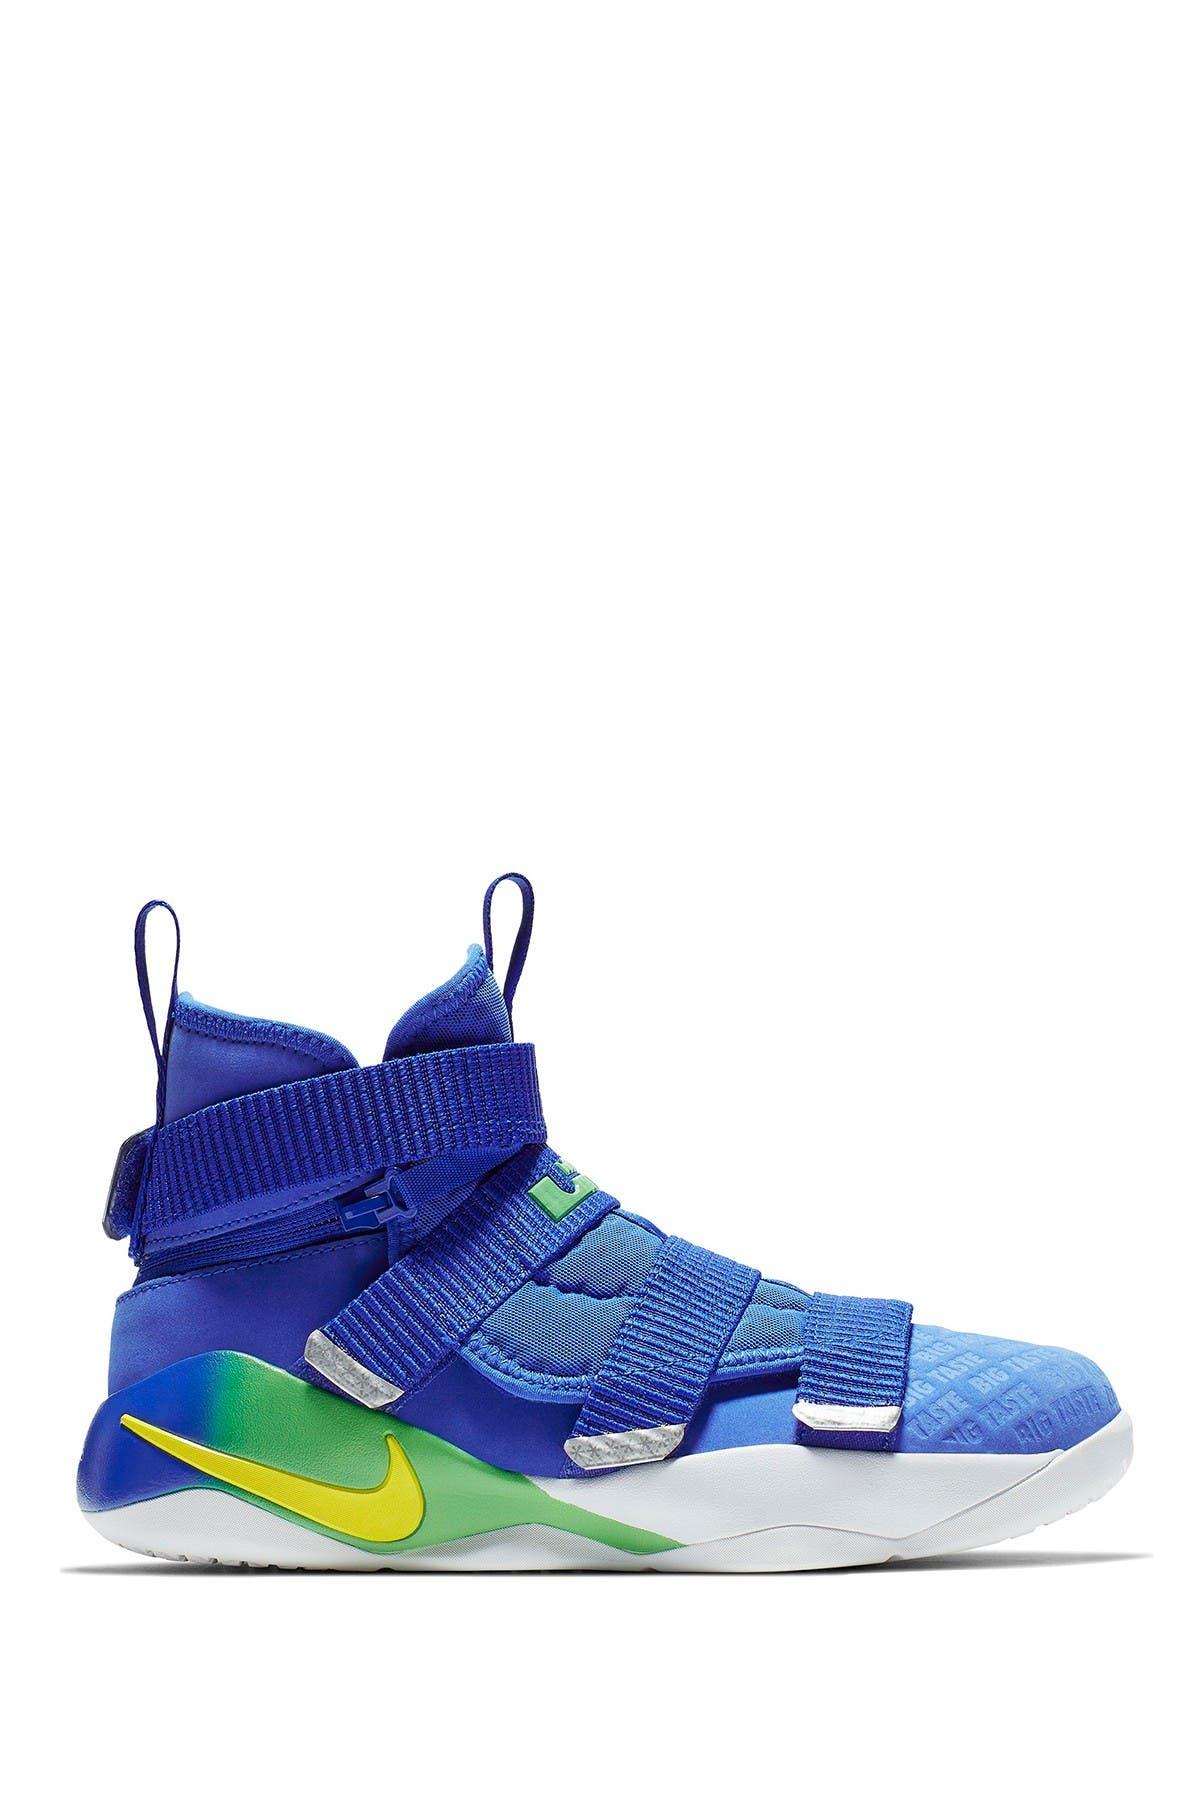 Nike | Lebron Soldier XI Flyease